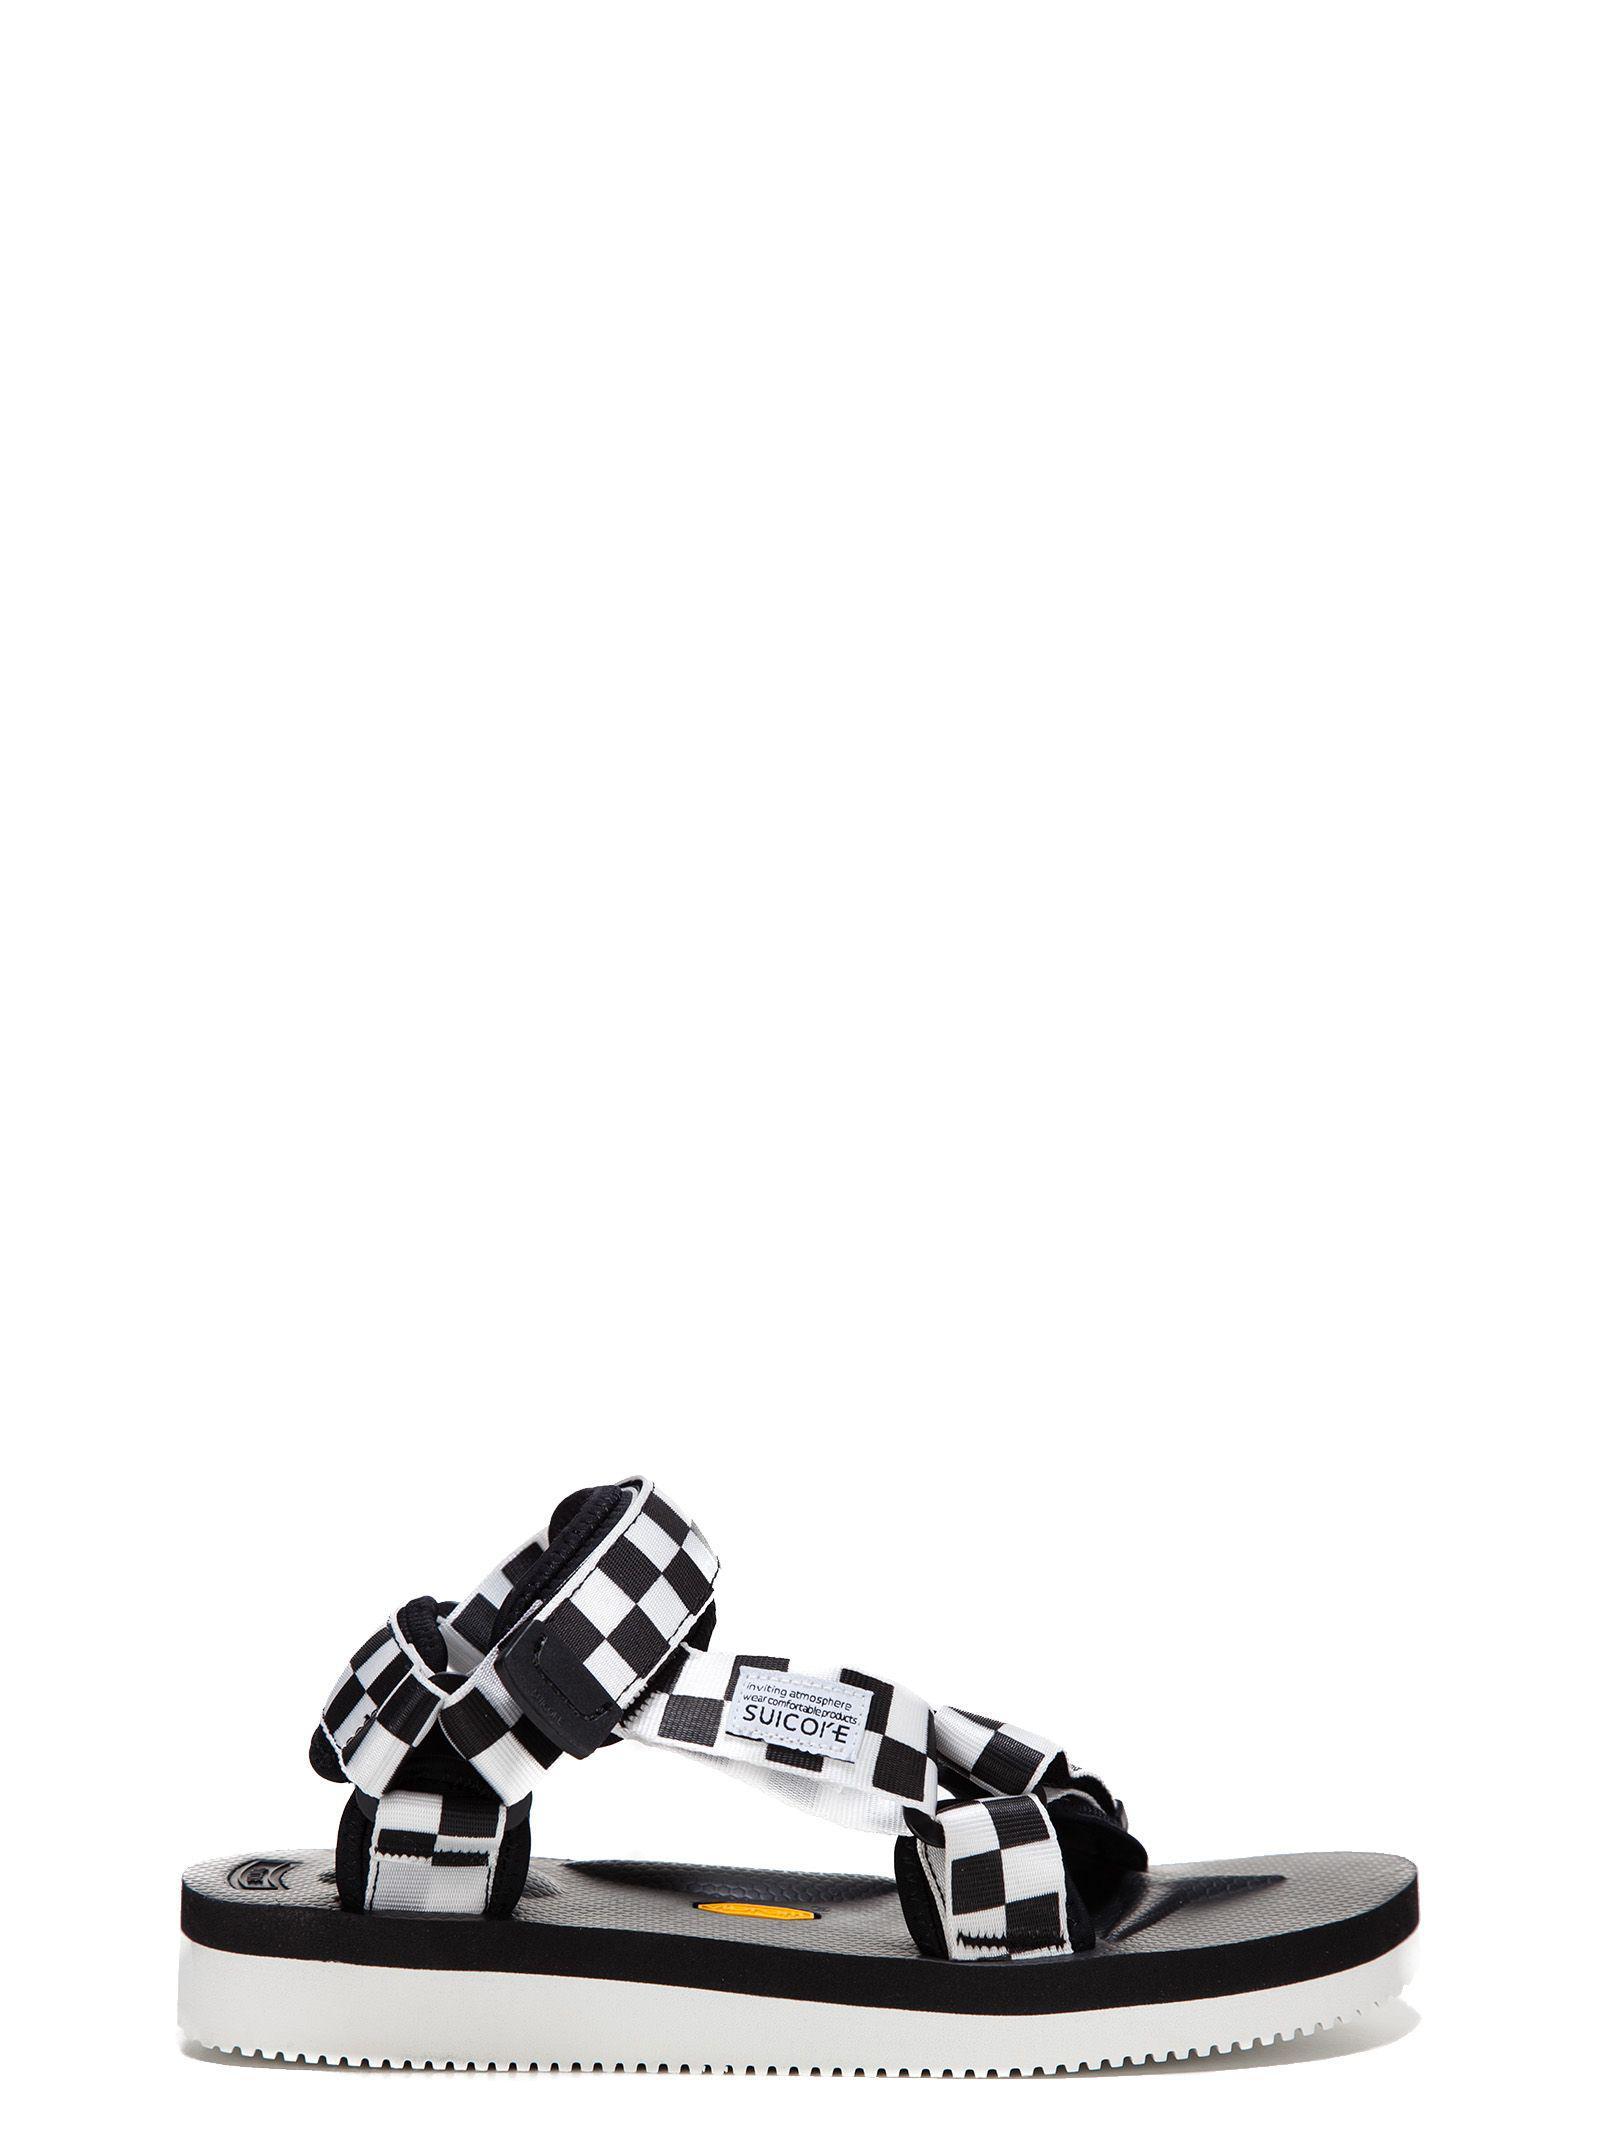 f5548653a3d0 Lyst - Suicoke Men s White black Fabric Sandals in Black for Men